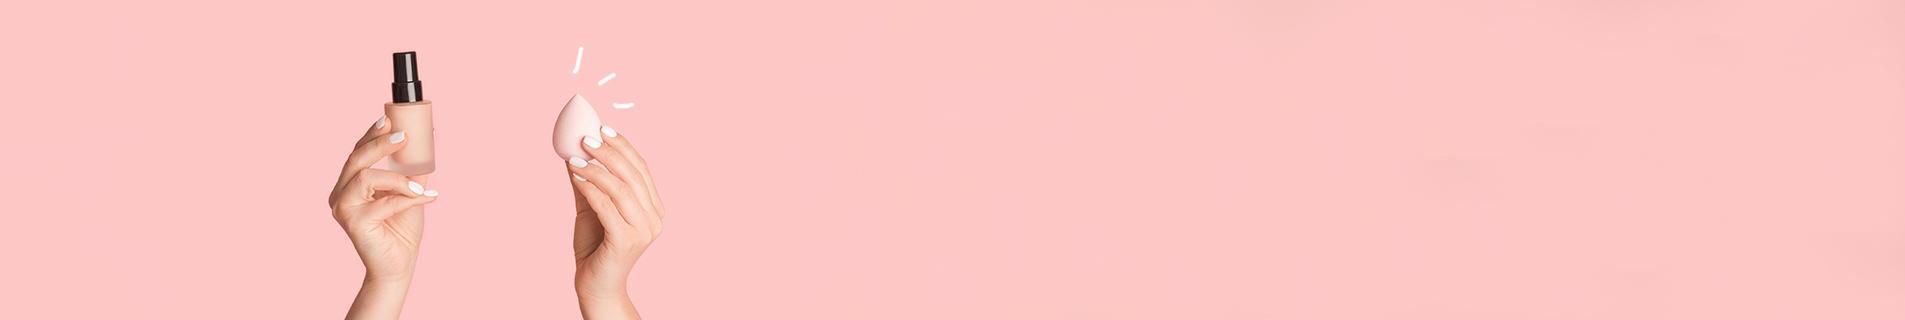 Contouring et highlighter pas cher | Maquillage teint | SAGA Cosmetics